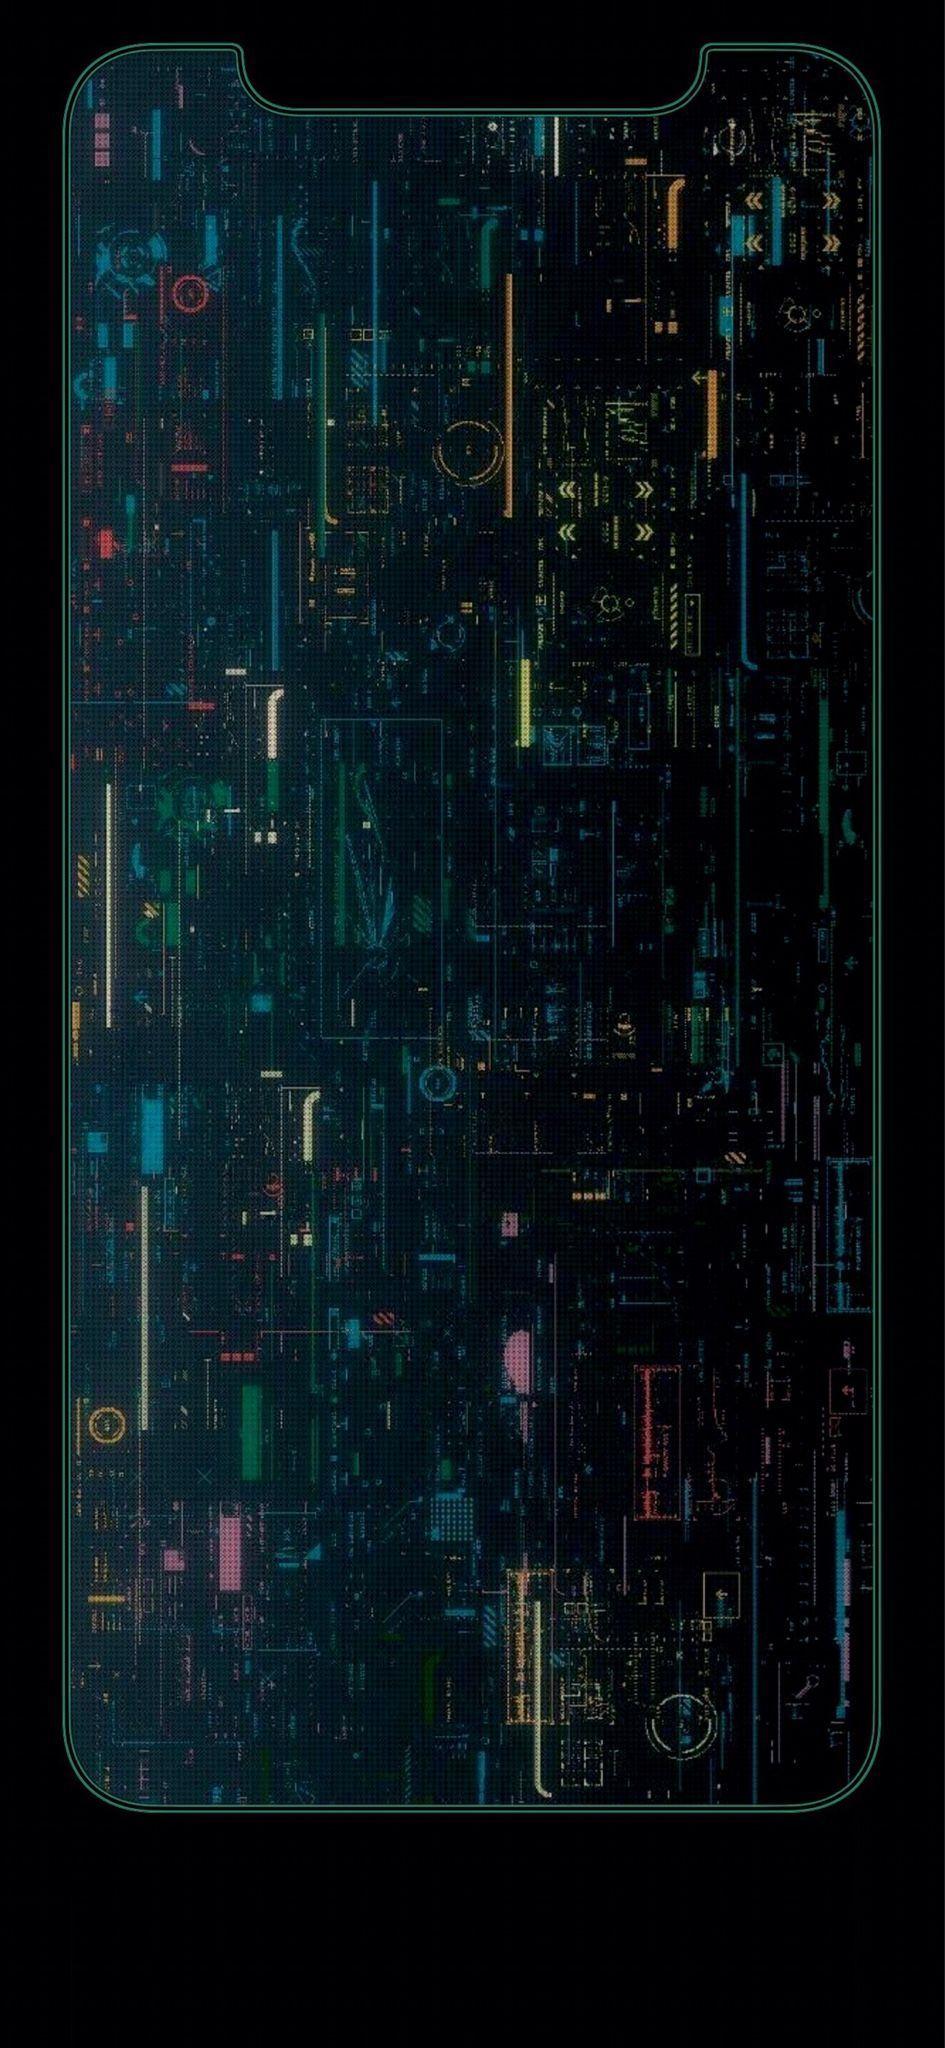 iPhone X Wallpaper Cyberpunk Luxury the iPhone X Wallpaper